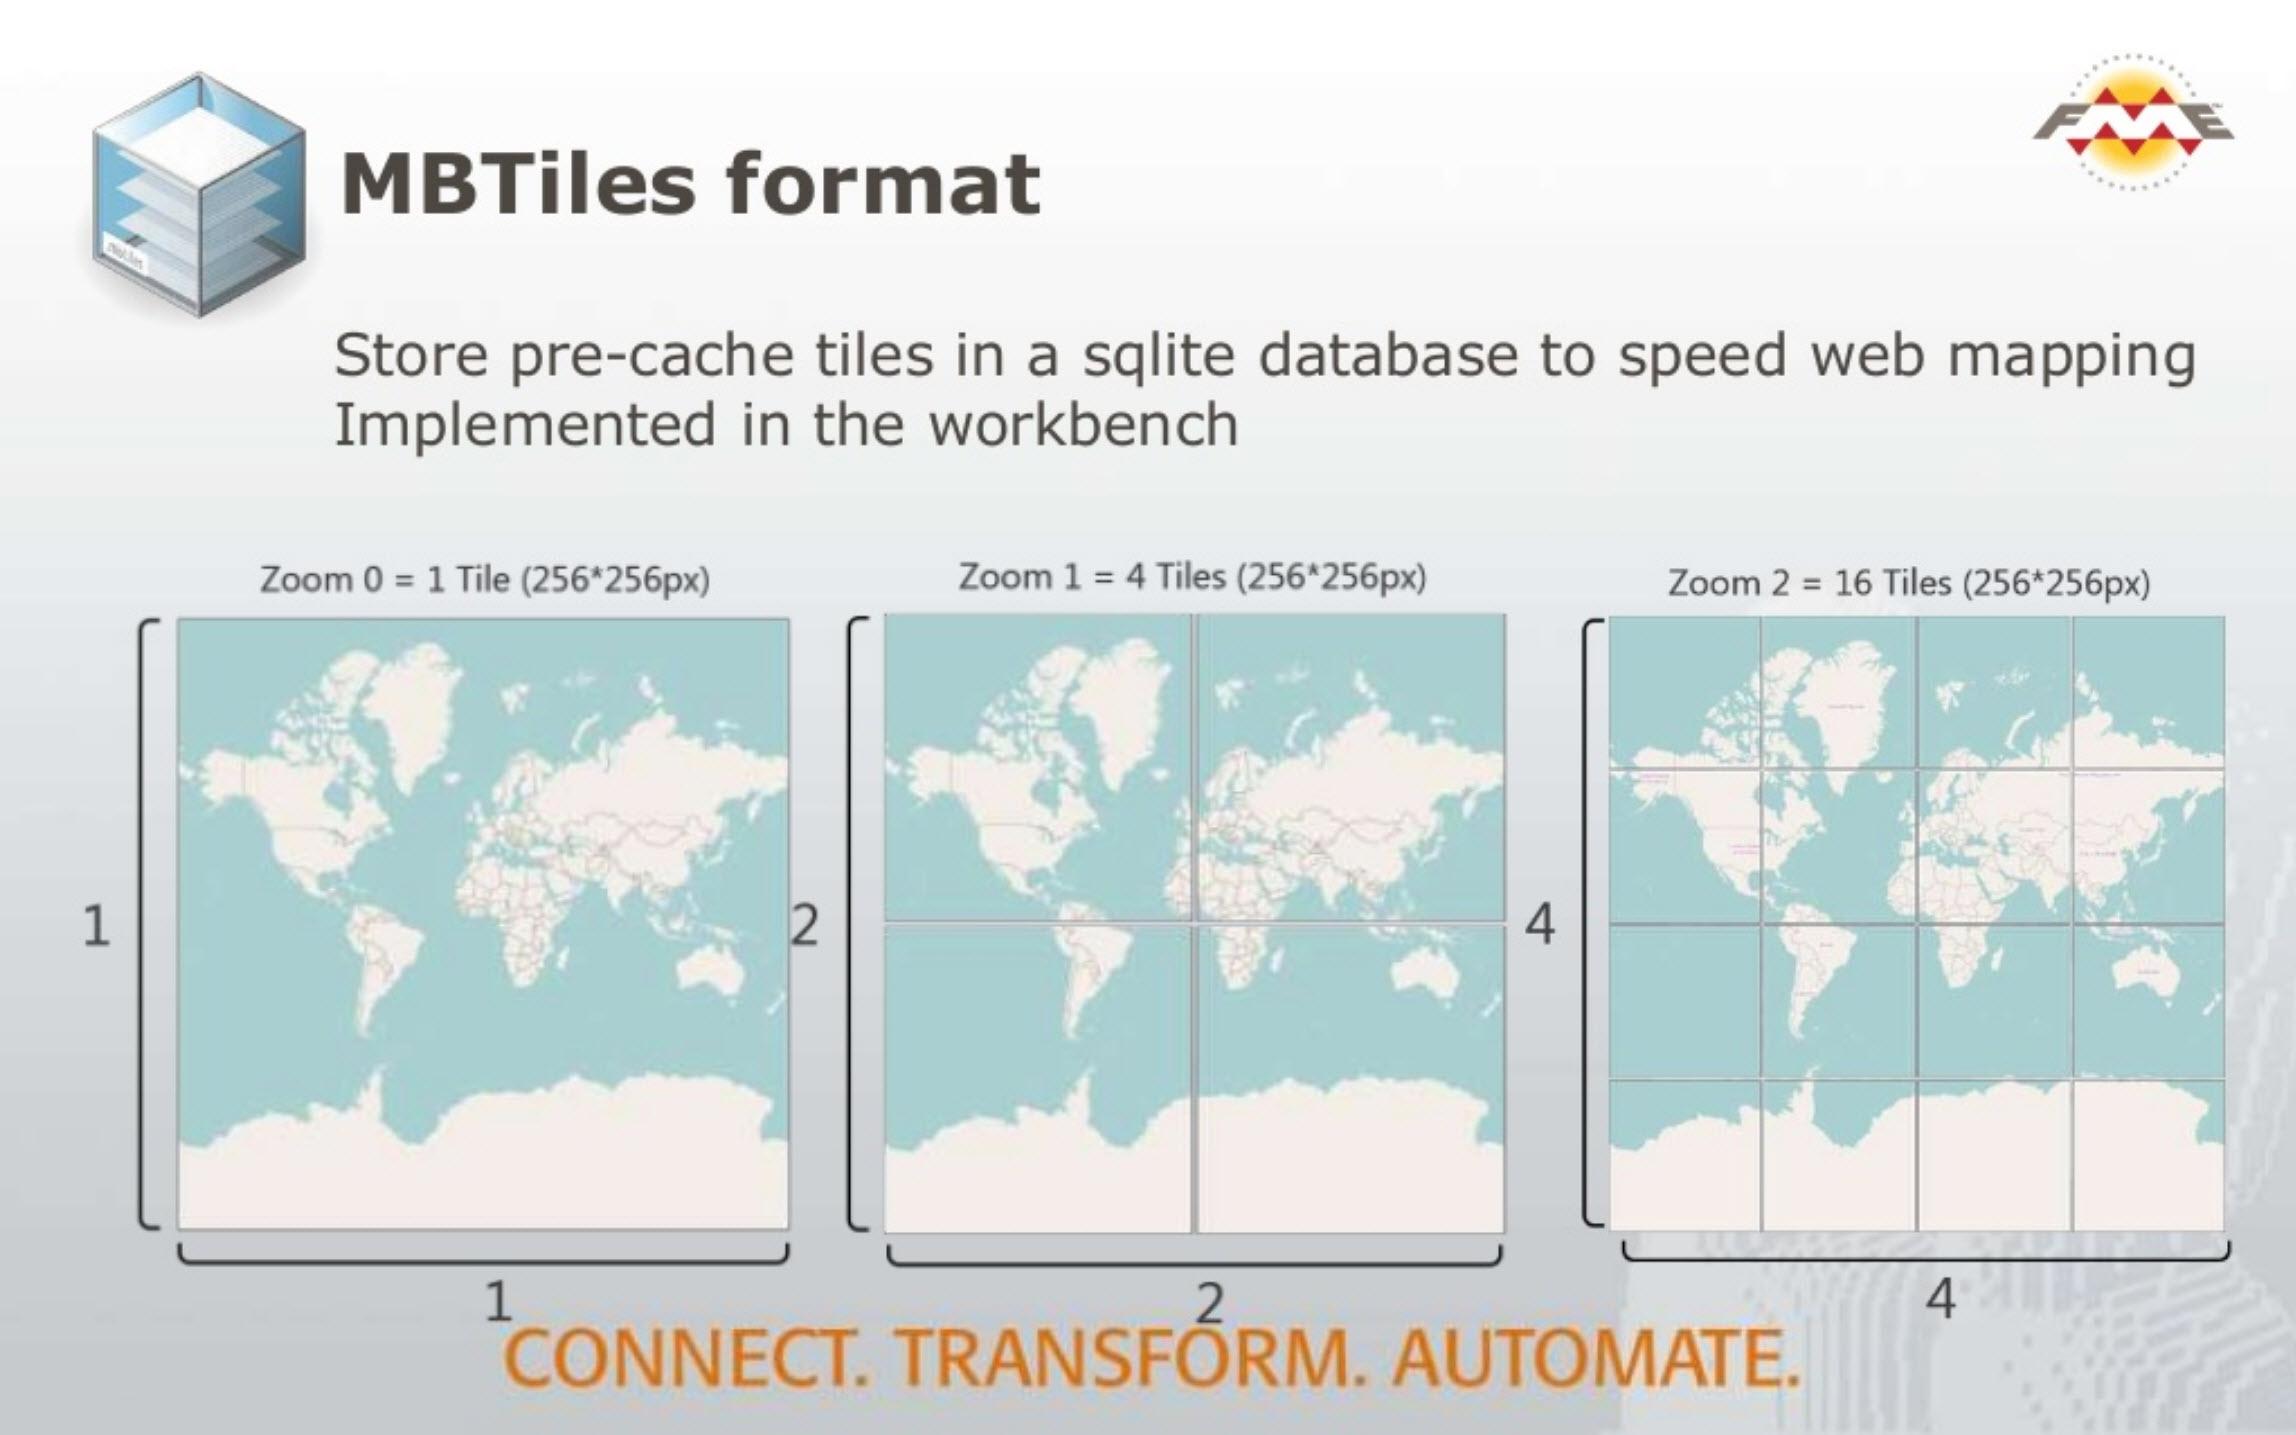 MBTiles Format FME